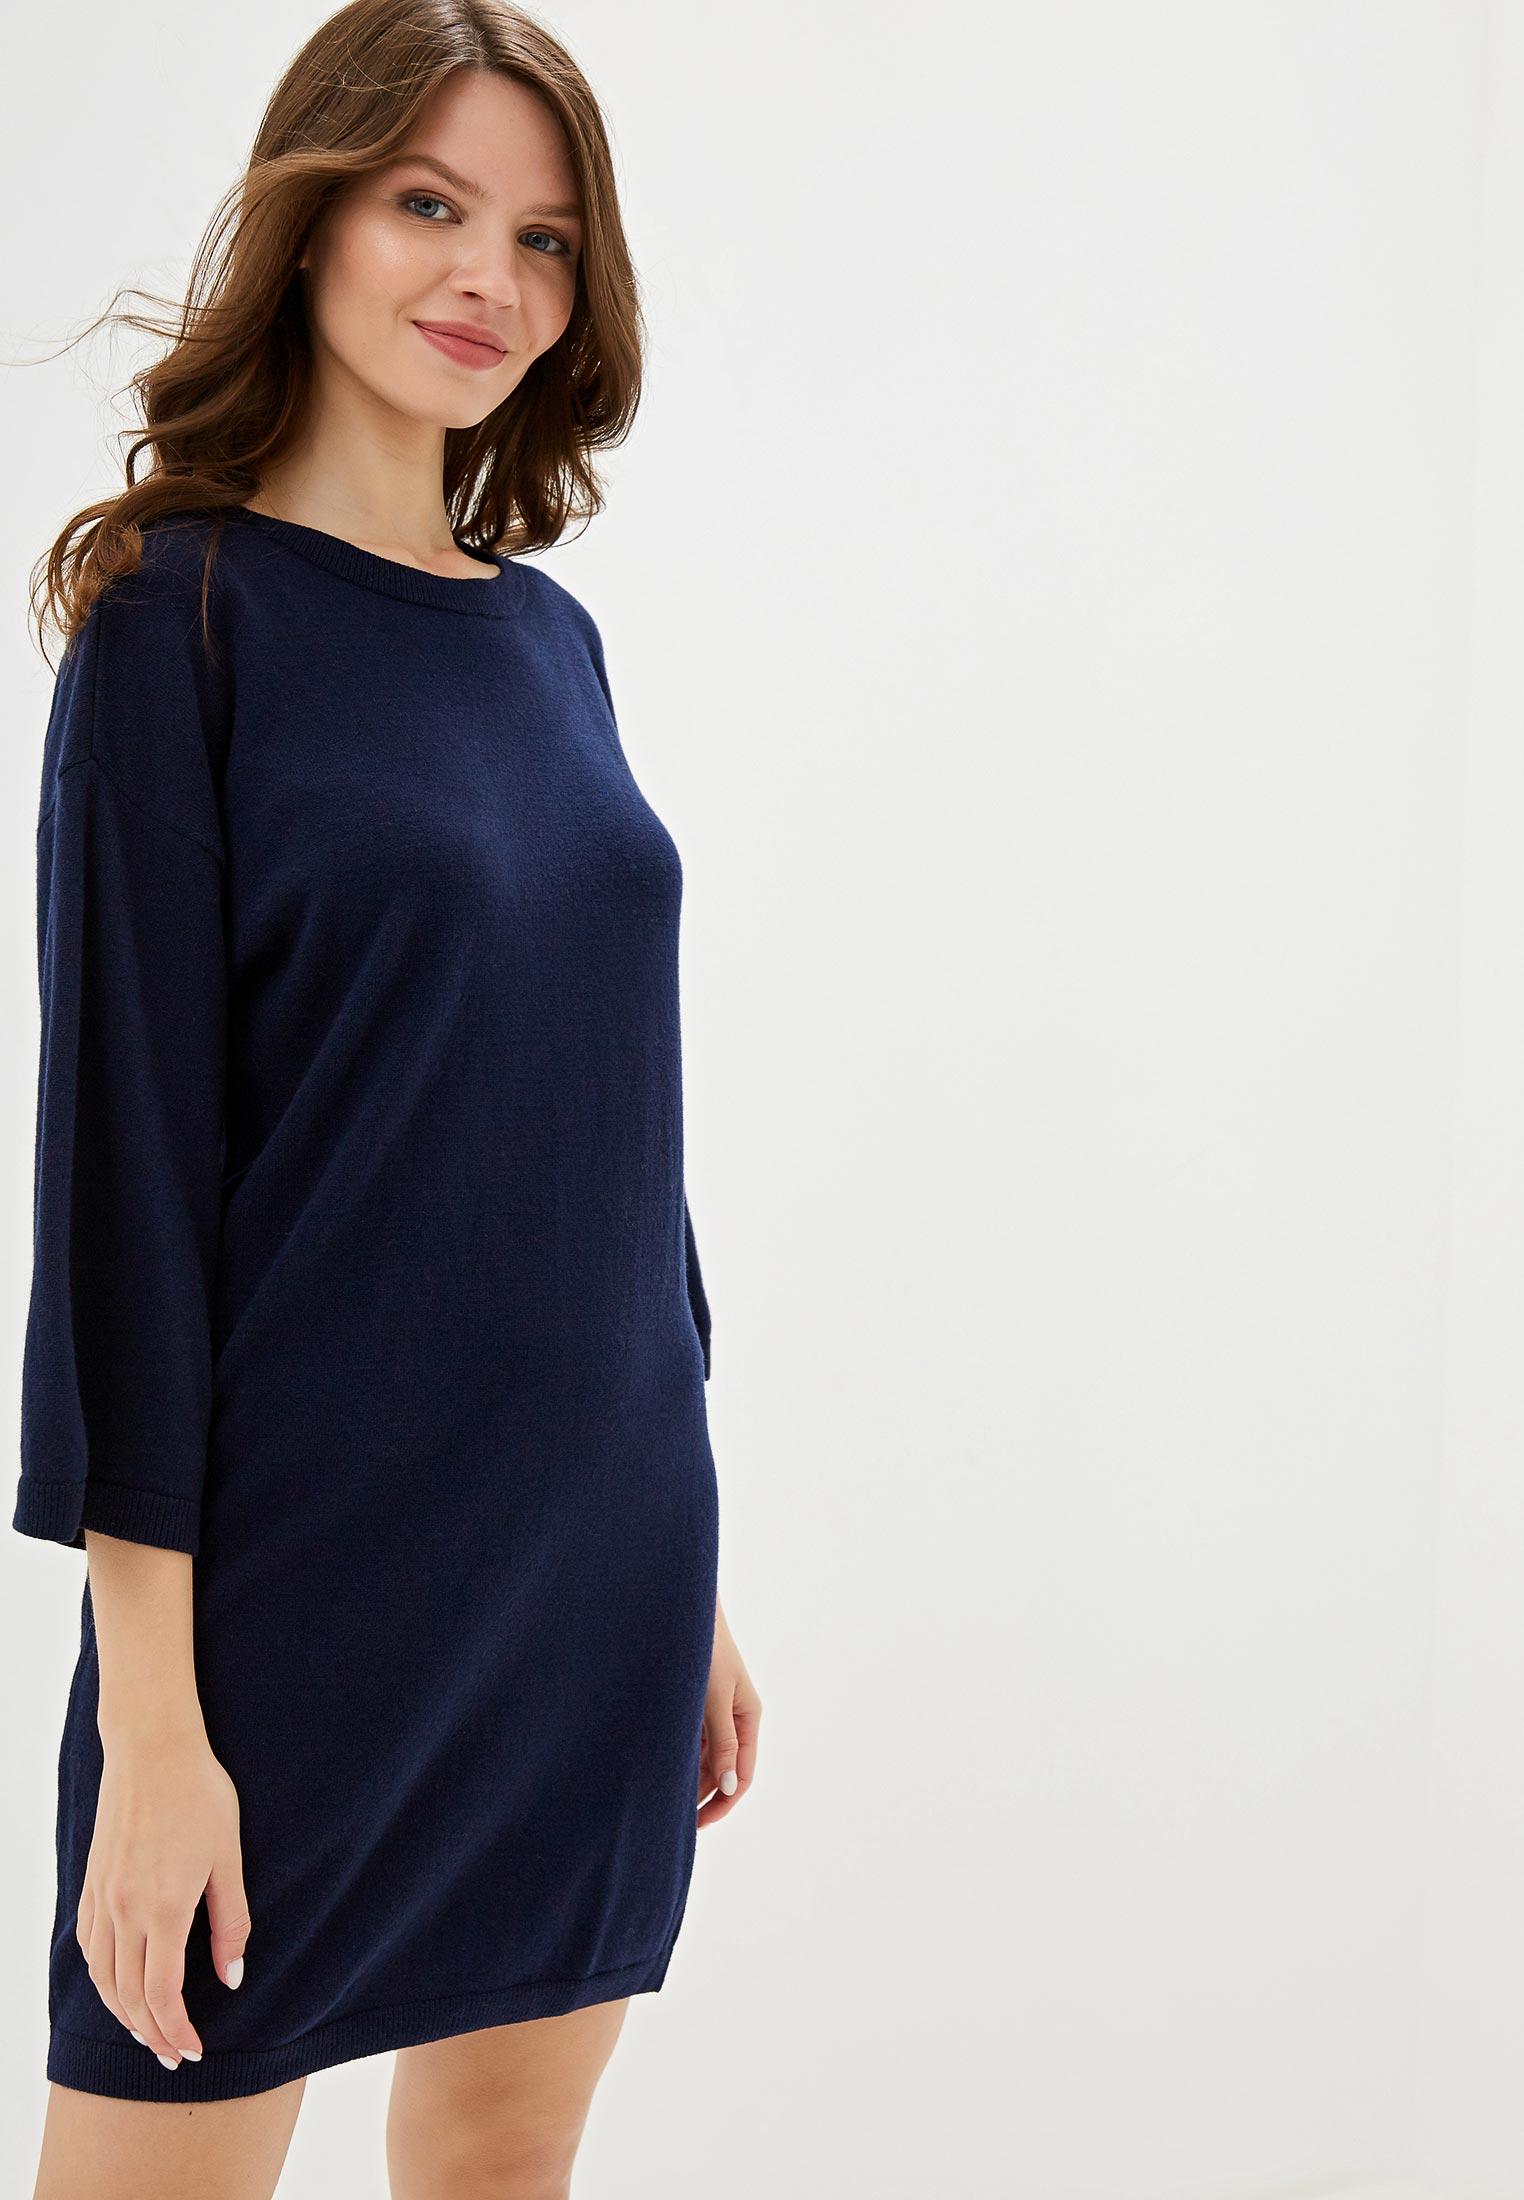 Вязаное платье United Colors of Benetton (Юнайтед Колорс оф Бенеттон) 1044V1J43